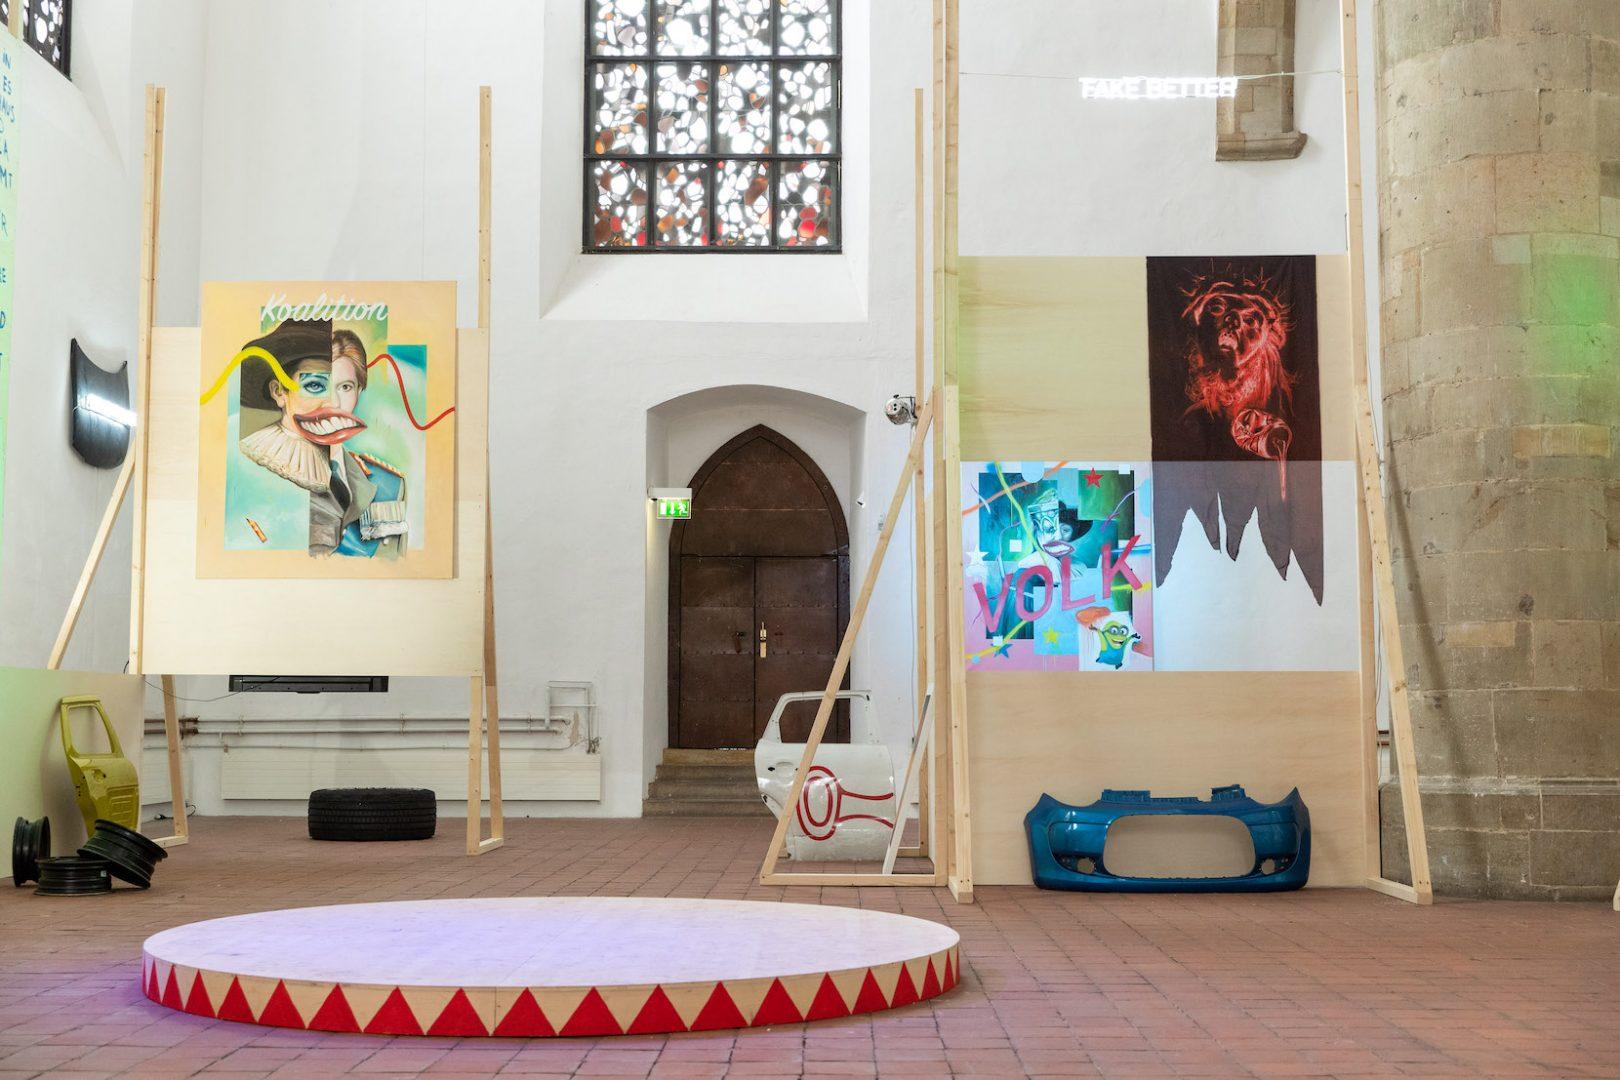 Filip Markiewicz | Celebration Factory, Ausstellungsansicht, Kunsthalle Osnabrück, 2019/20. Foto: Filip Markiewicz. Courtesy Filip Markiewicz / Kunsthalle Osnabrück